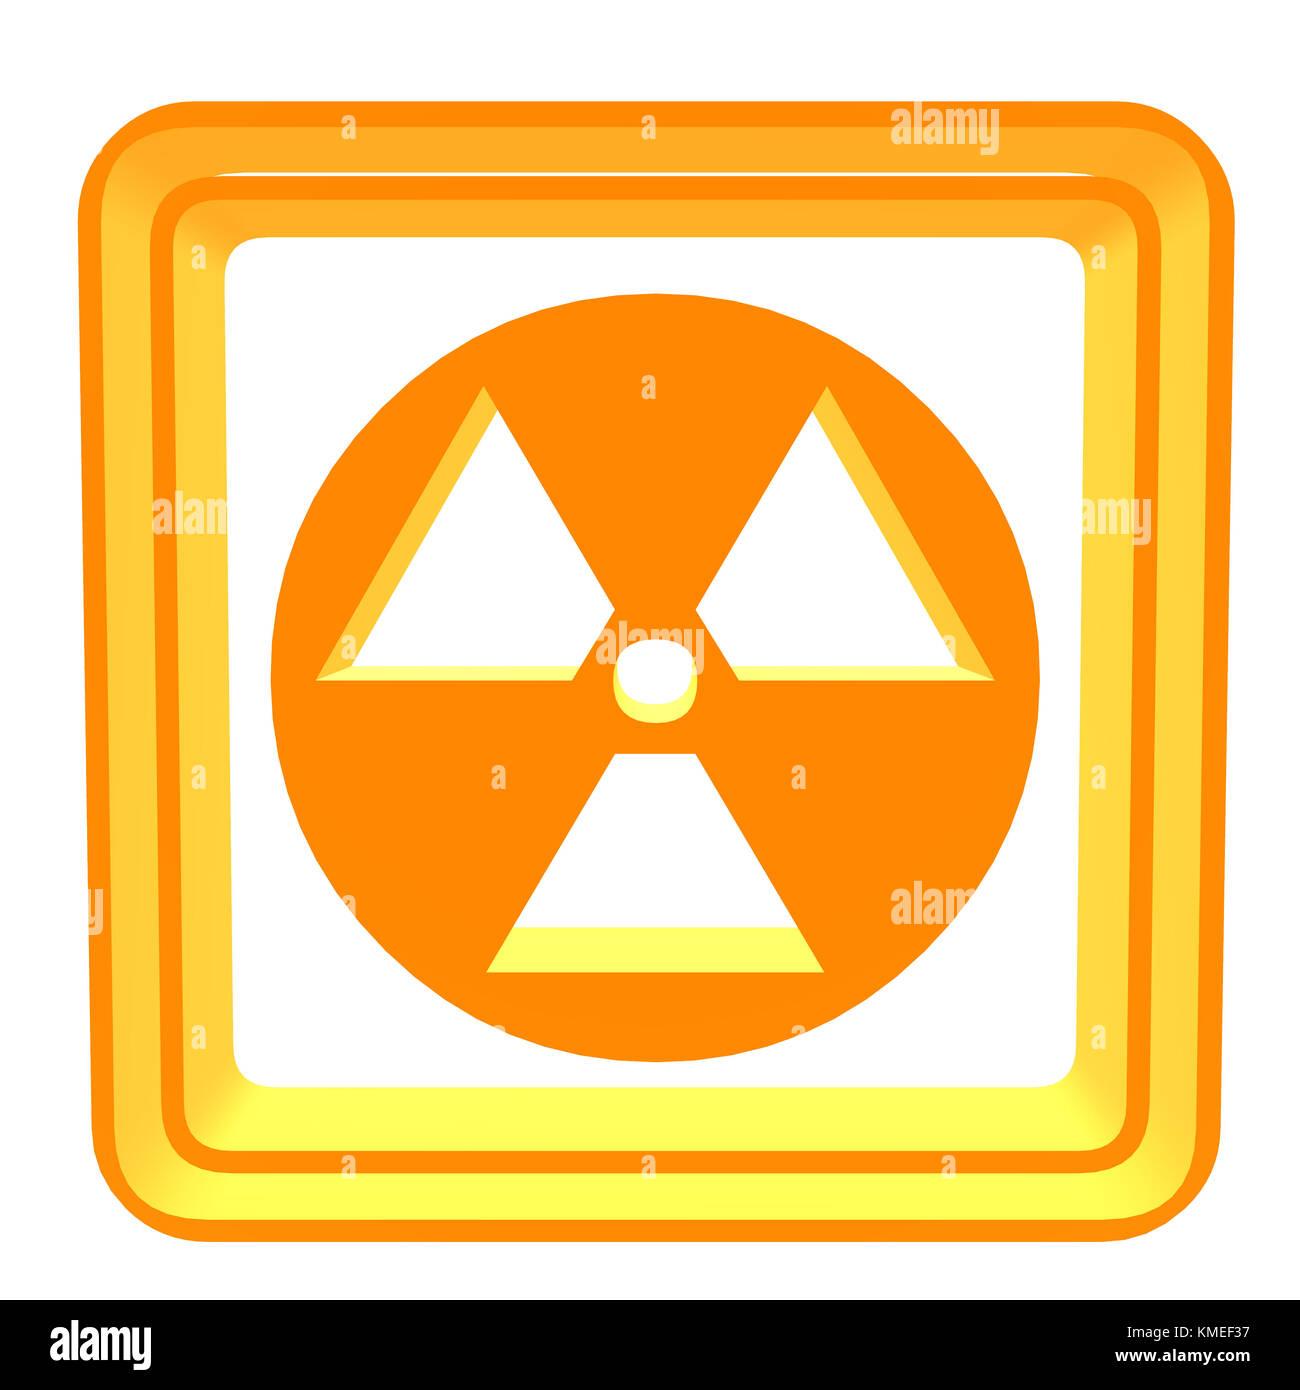 3D bio hazard symbol on a white background - Stock Image